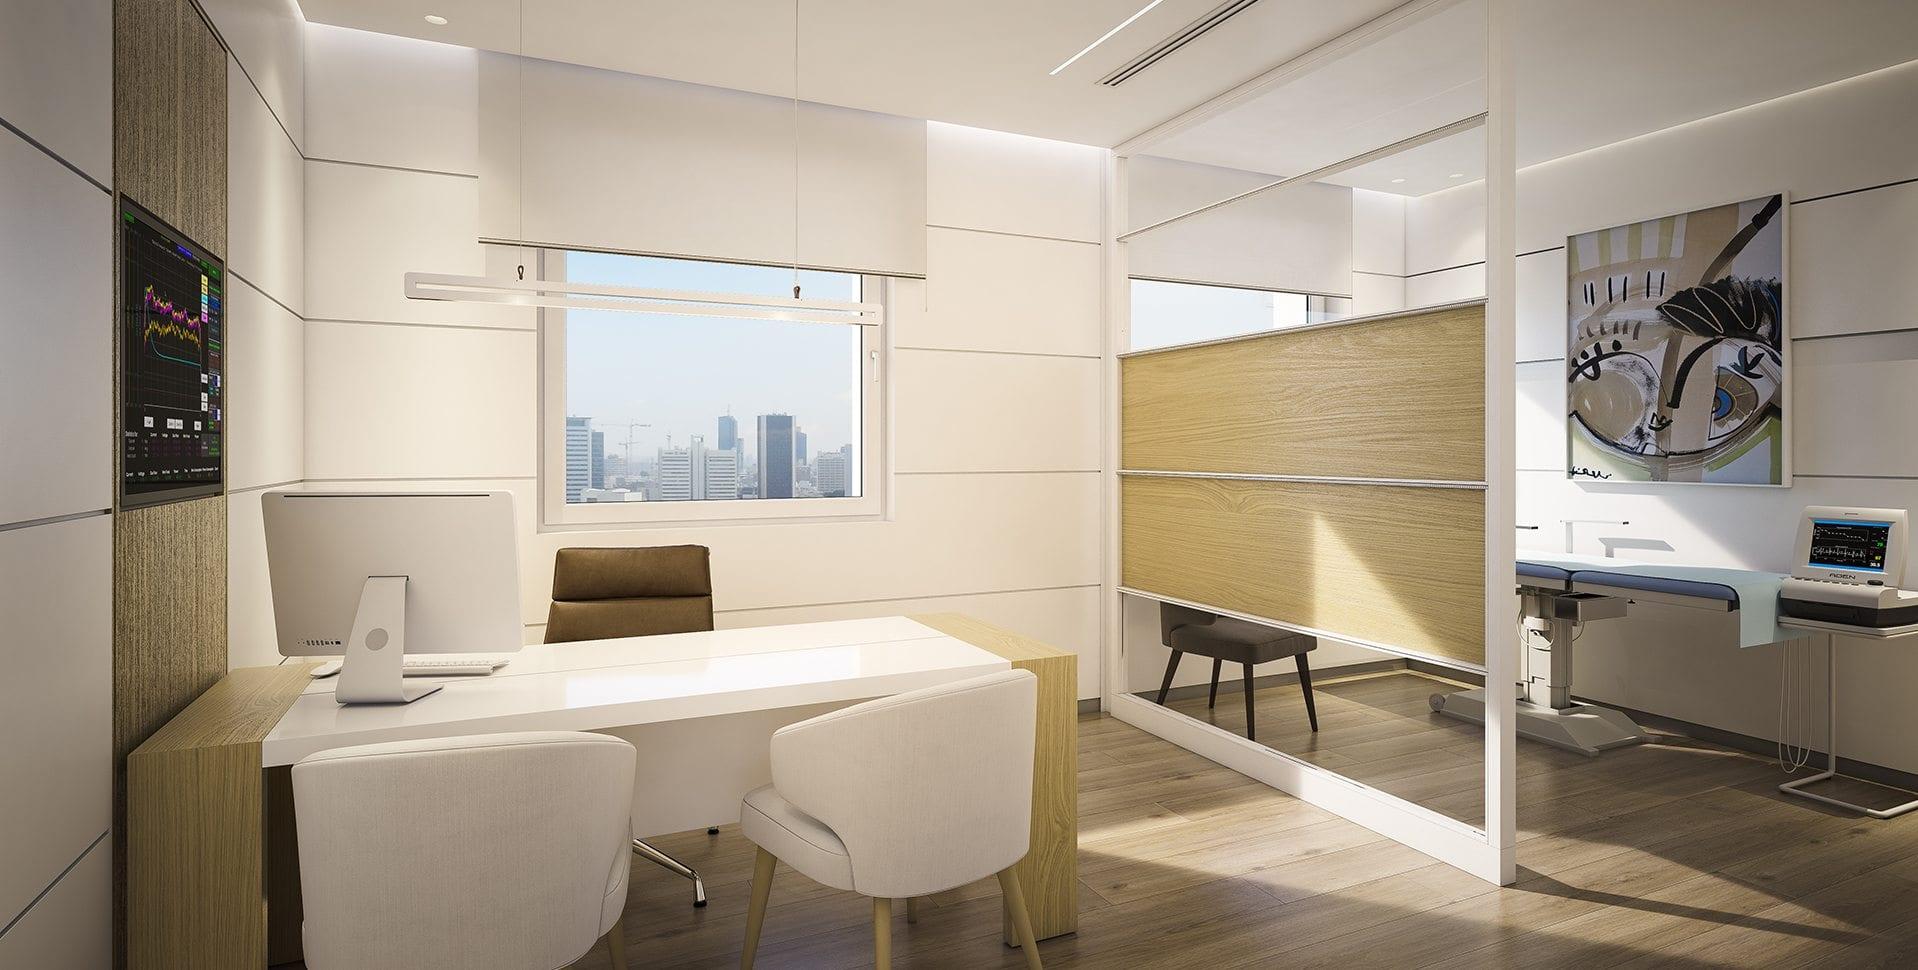 Maayan-Golan_Architectural-Visualization_ clinic-interior-visualization_ doctors-office_naara-medical-center_habarzel-tel-aviv_02